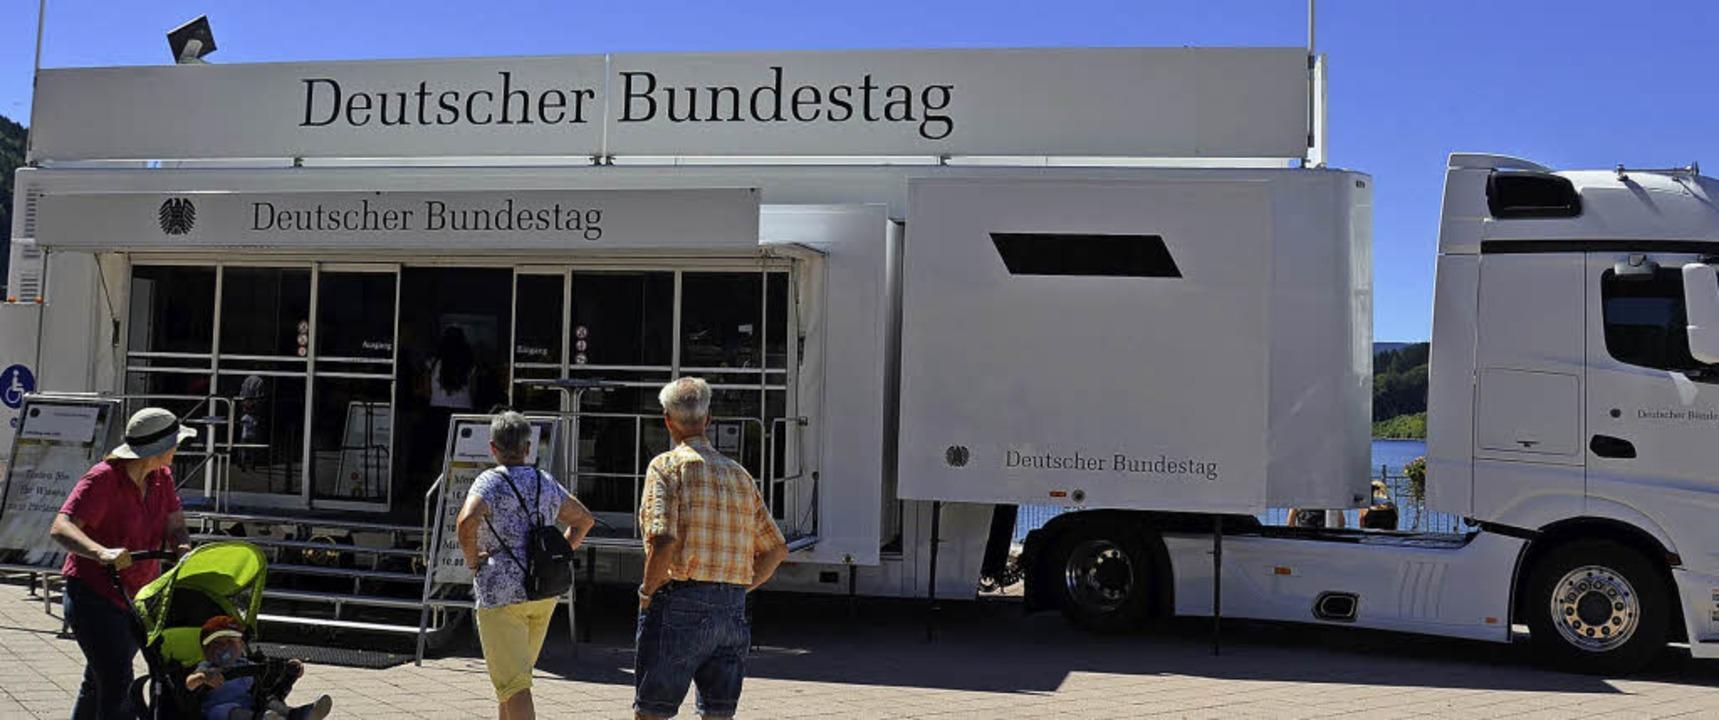 Sommer, Sonne, Bundestag? Der Sattelzug in Titisee macht neugierig.  | Foto: Sarah Beha